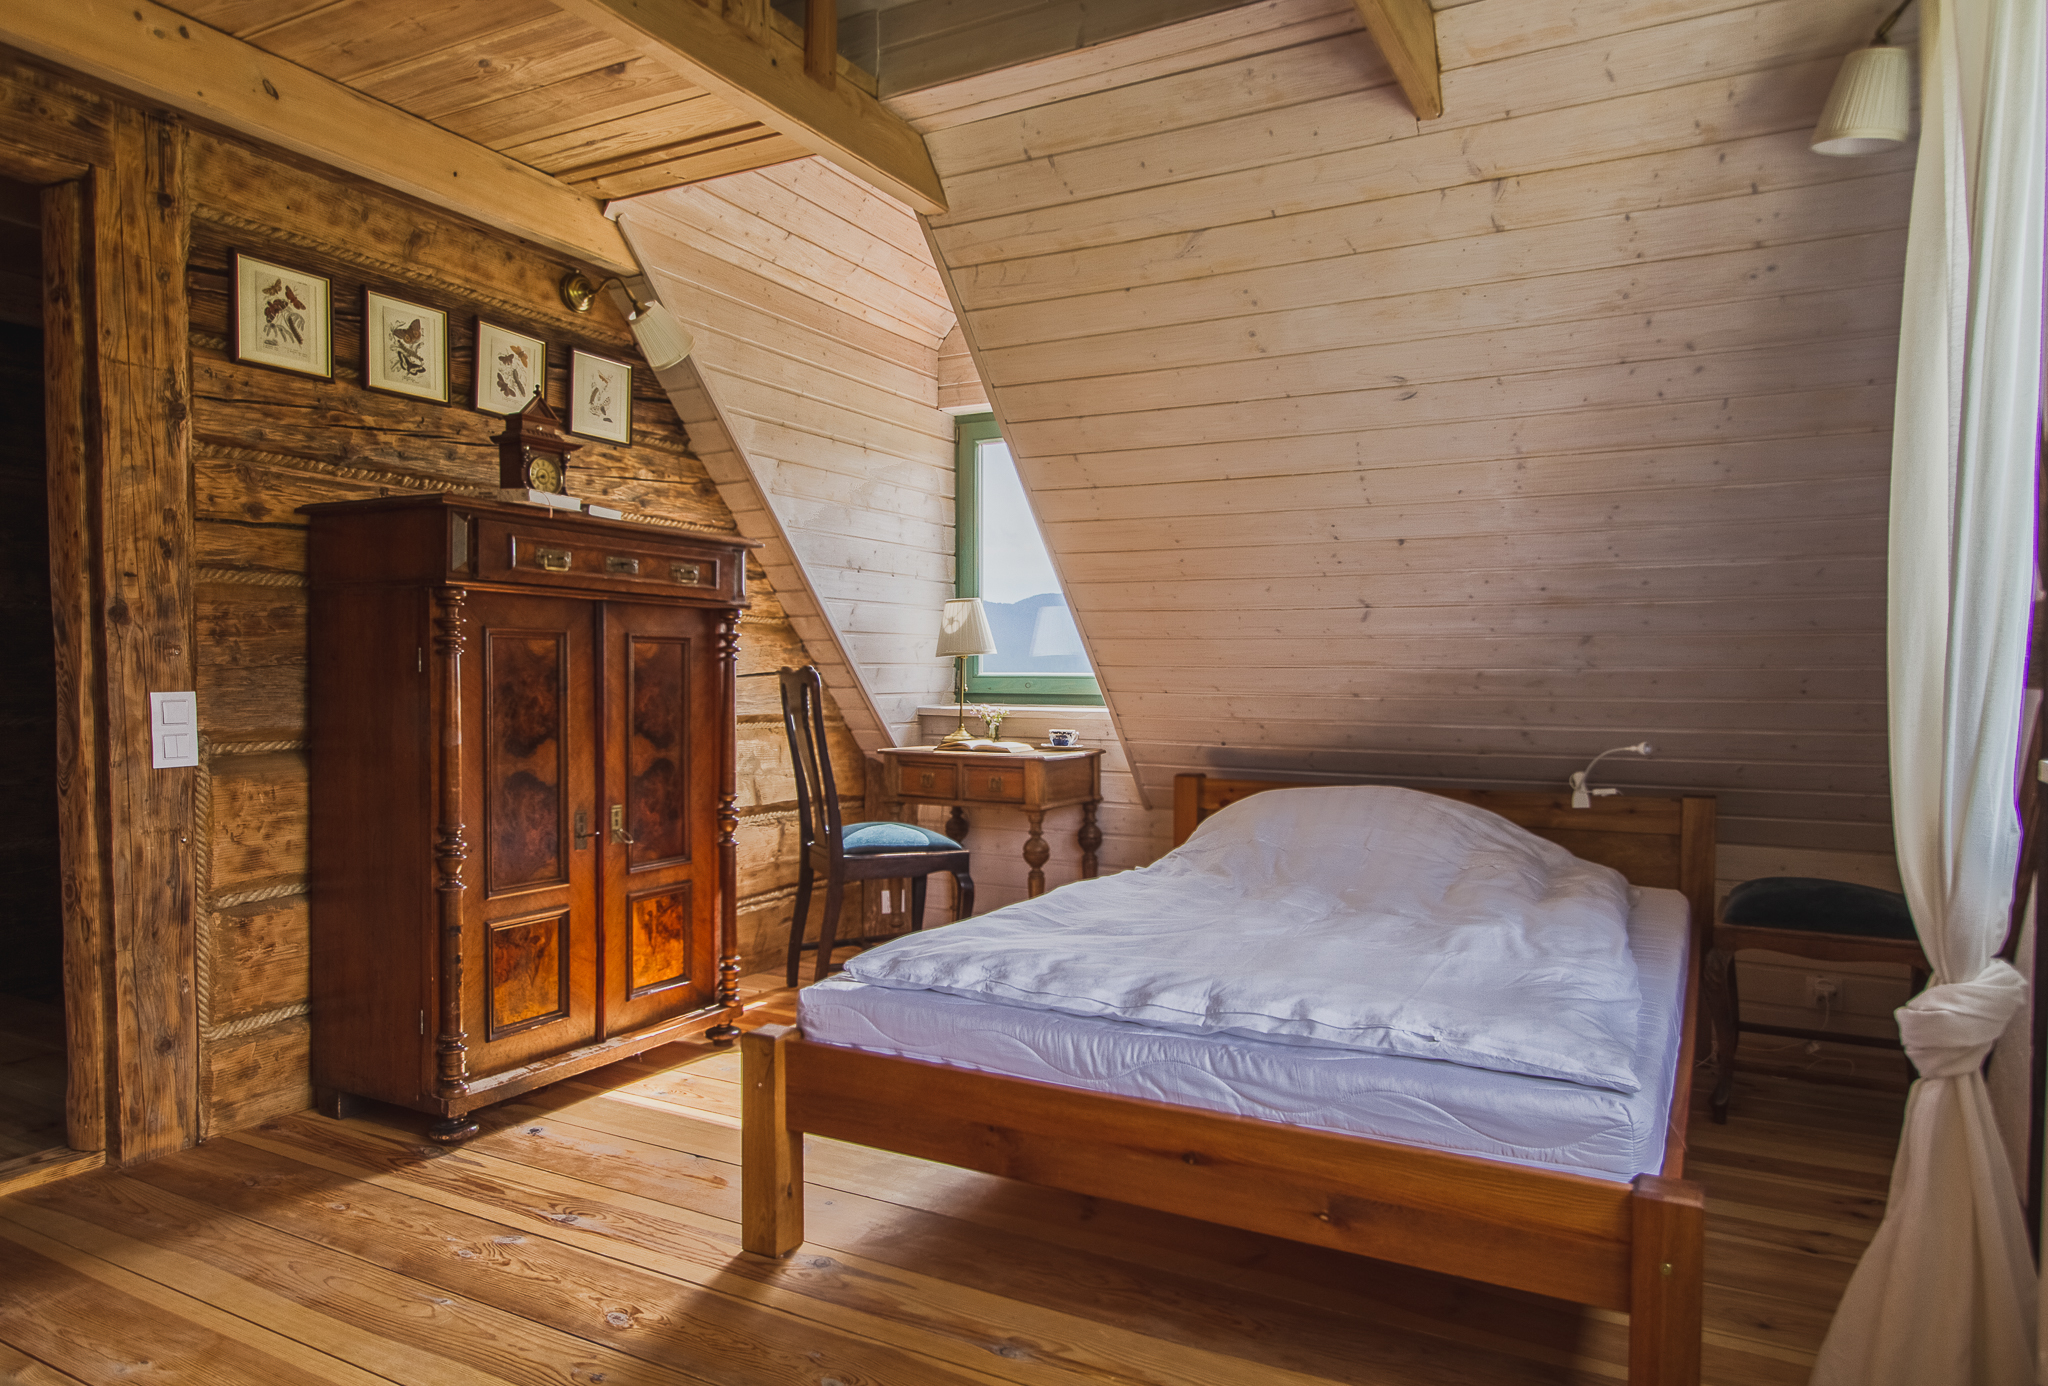 Manichatki - Chatka Mani - Where will I sleep?